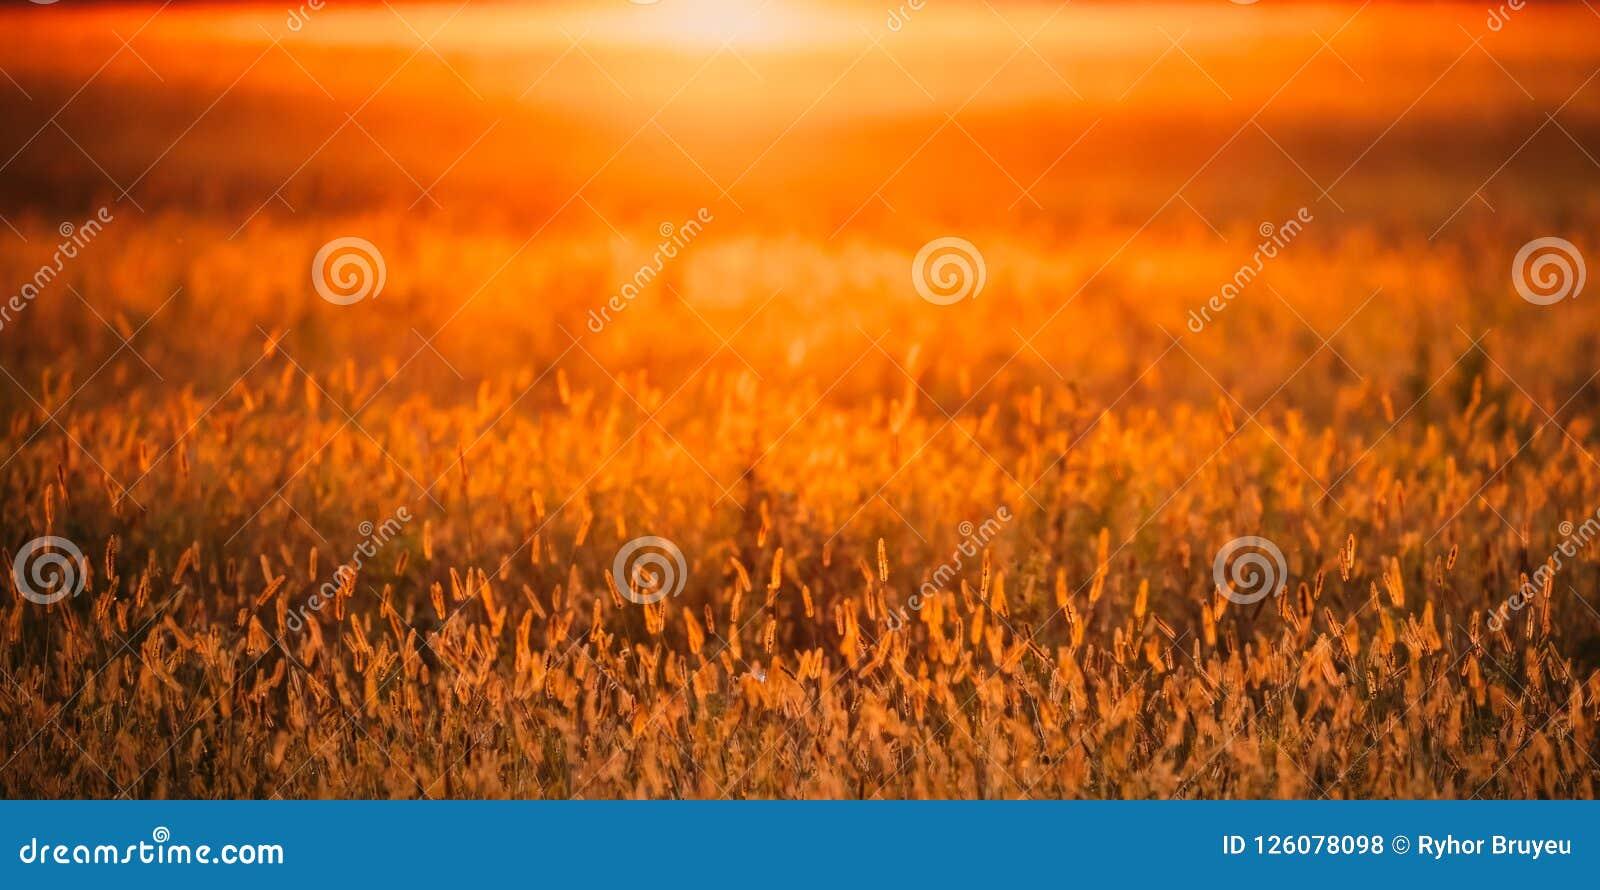 Meadow Grass In Yellow Sunlight Background. Autumn Season